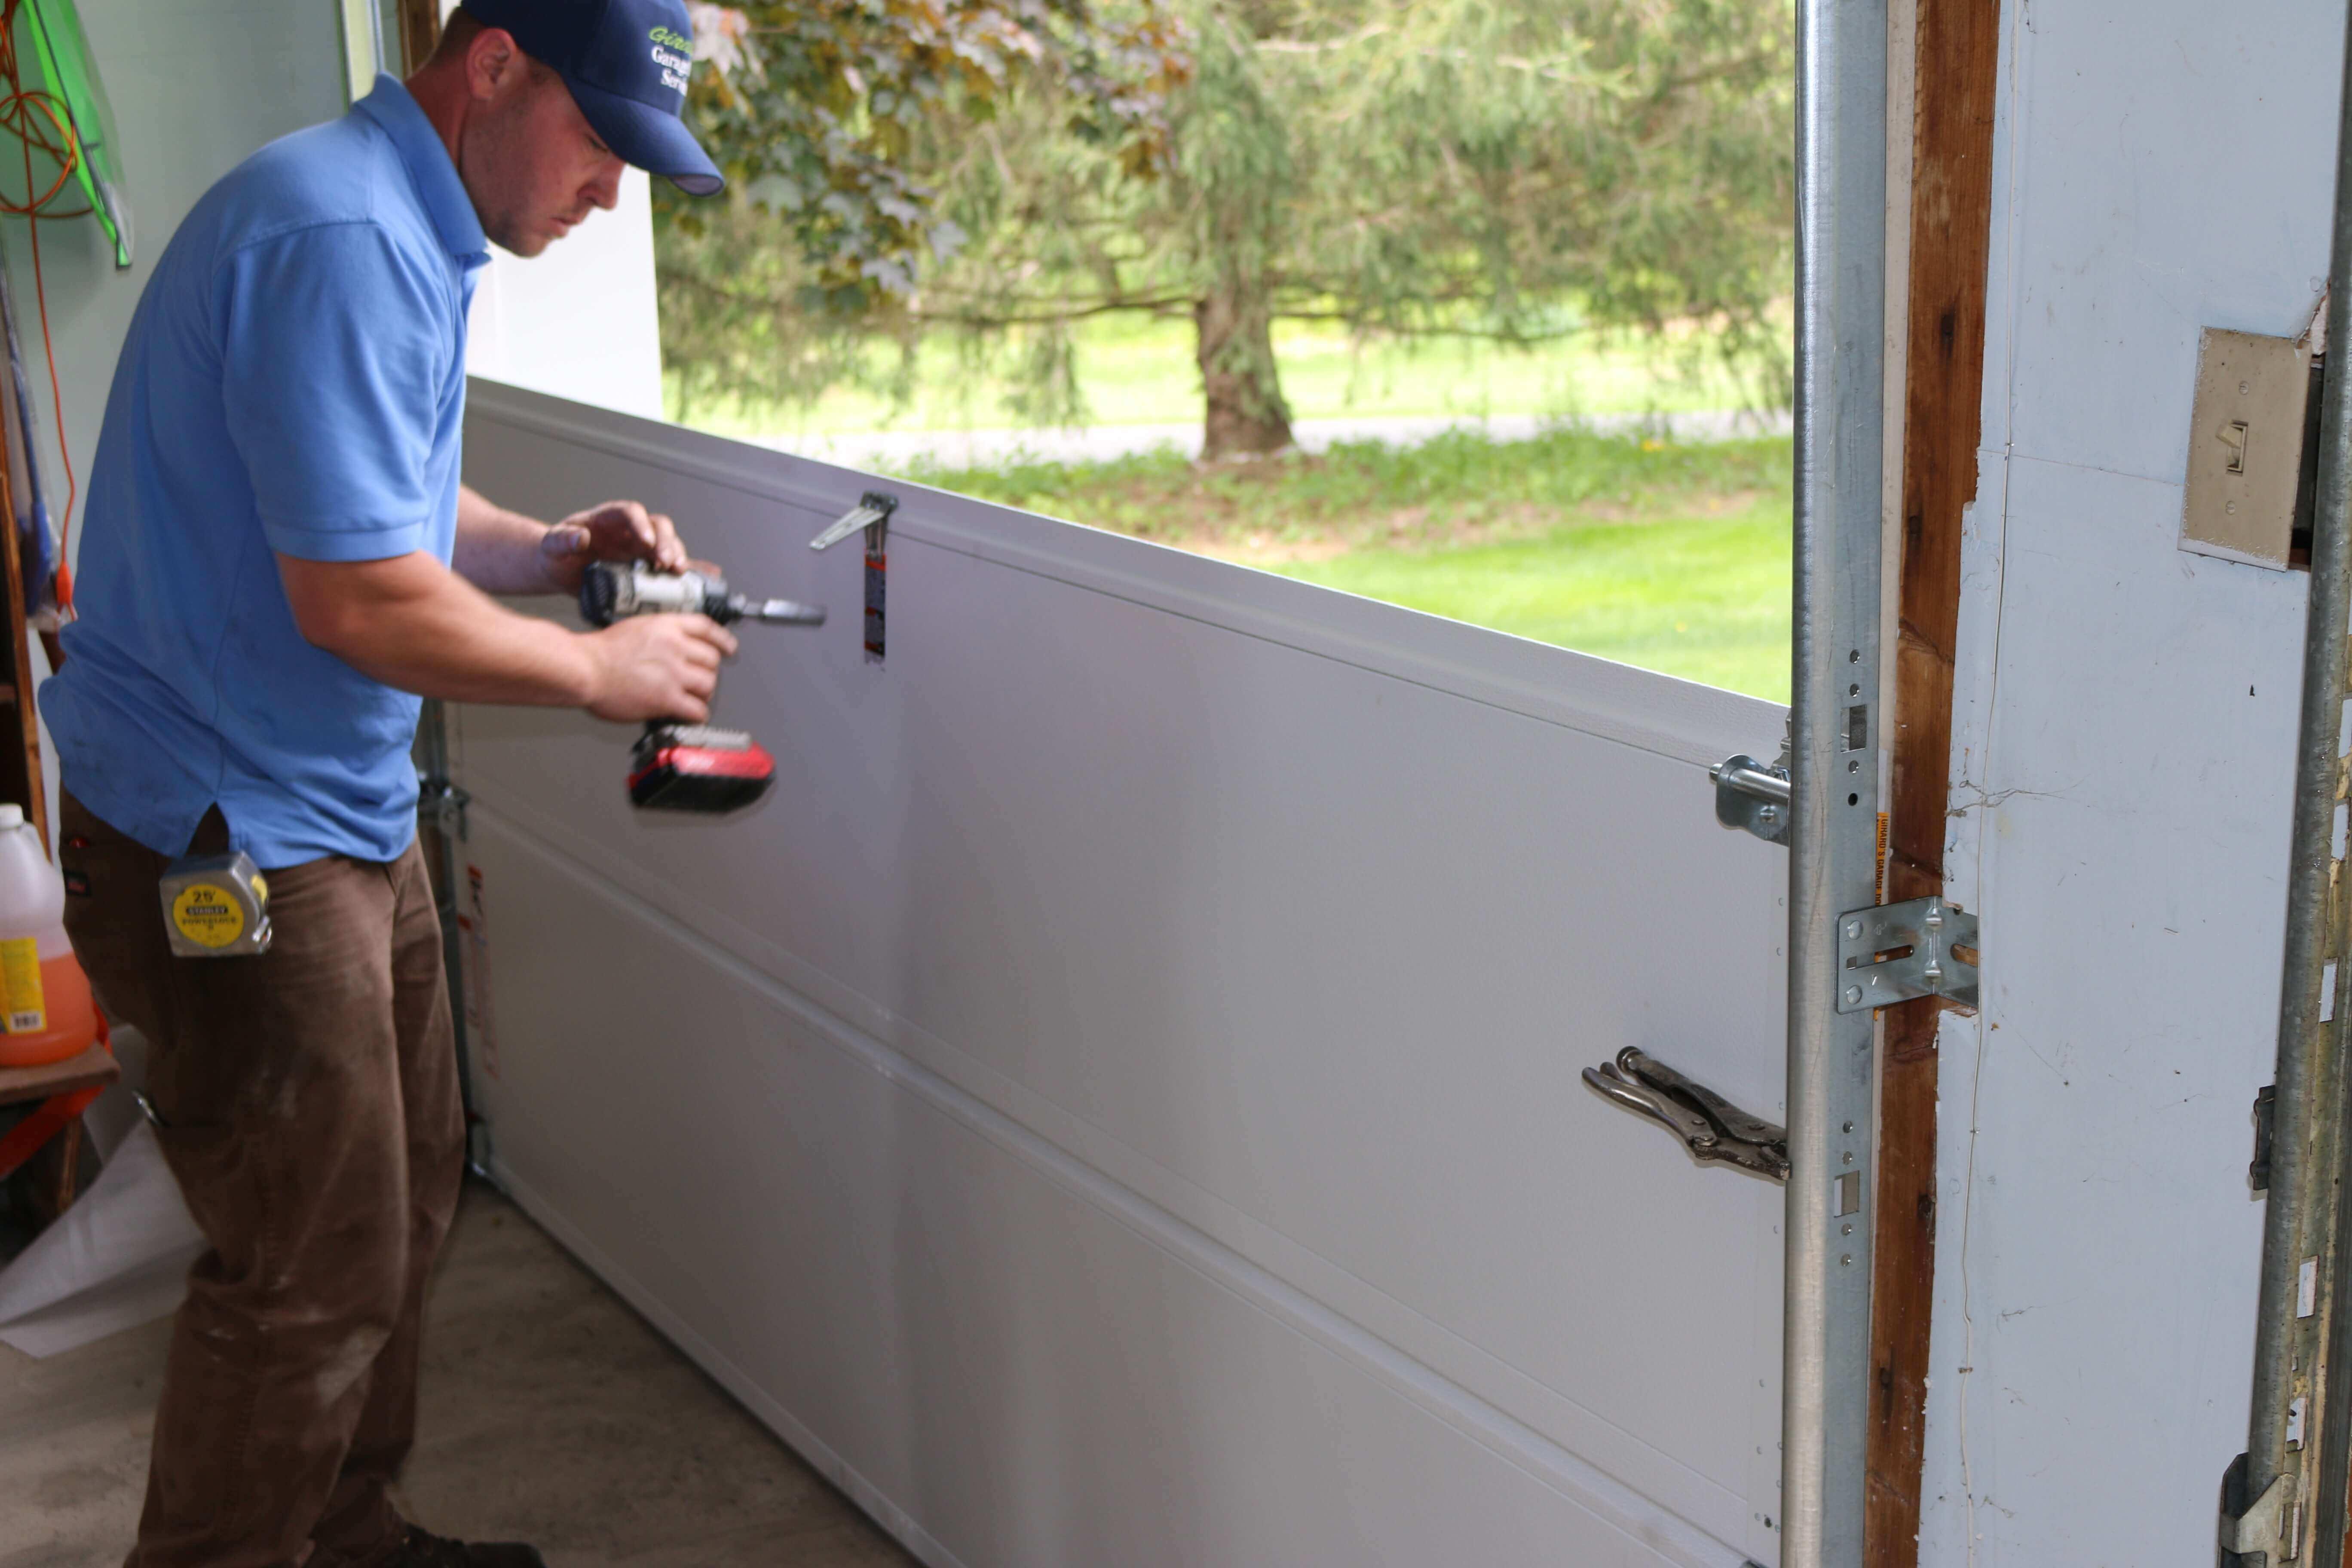 Lion Garage Door Repair U0026 Installation 3607 Tarheel Dr, Raleigh, NC 27609    YP.com